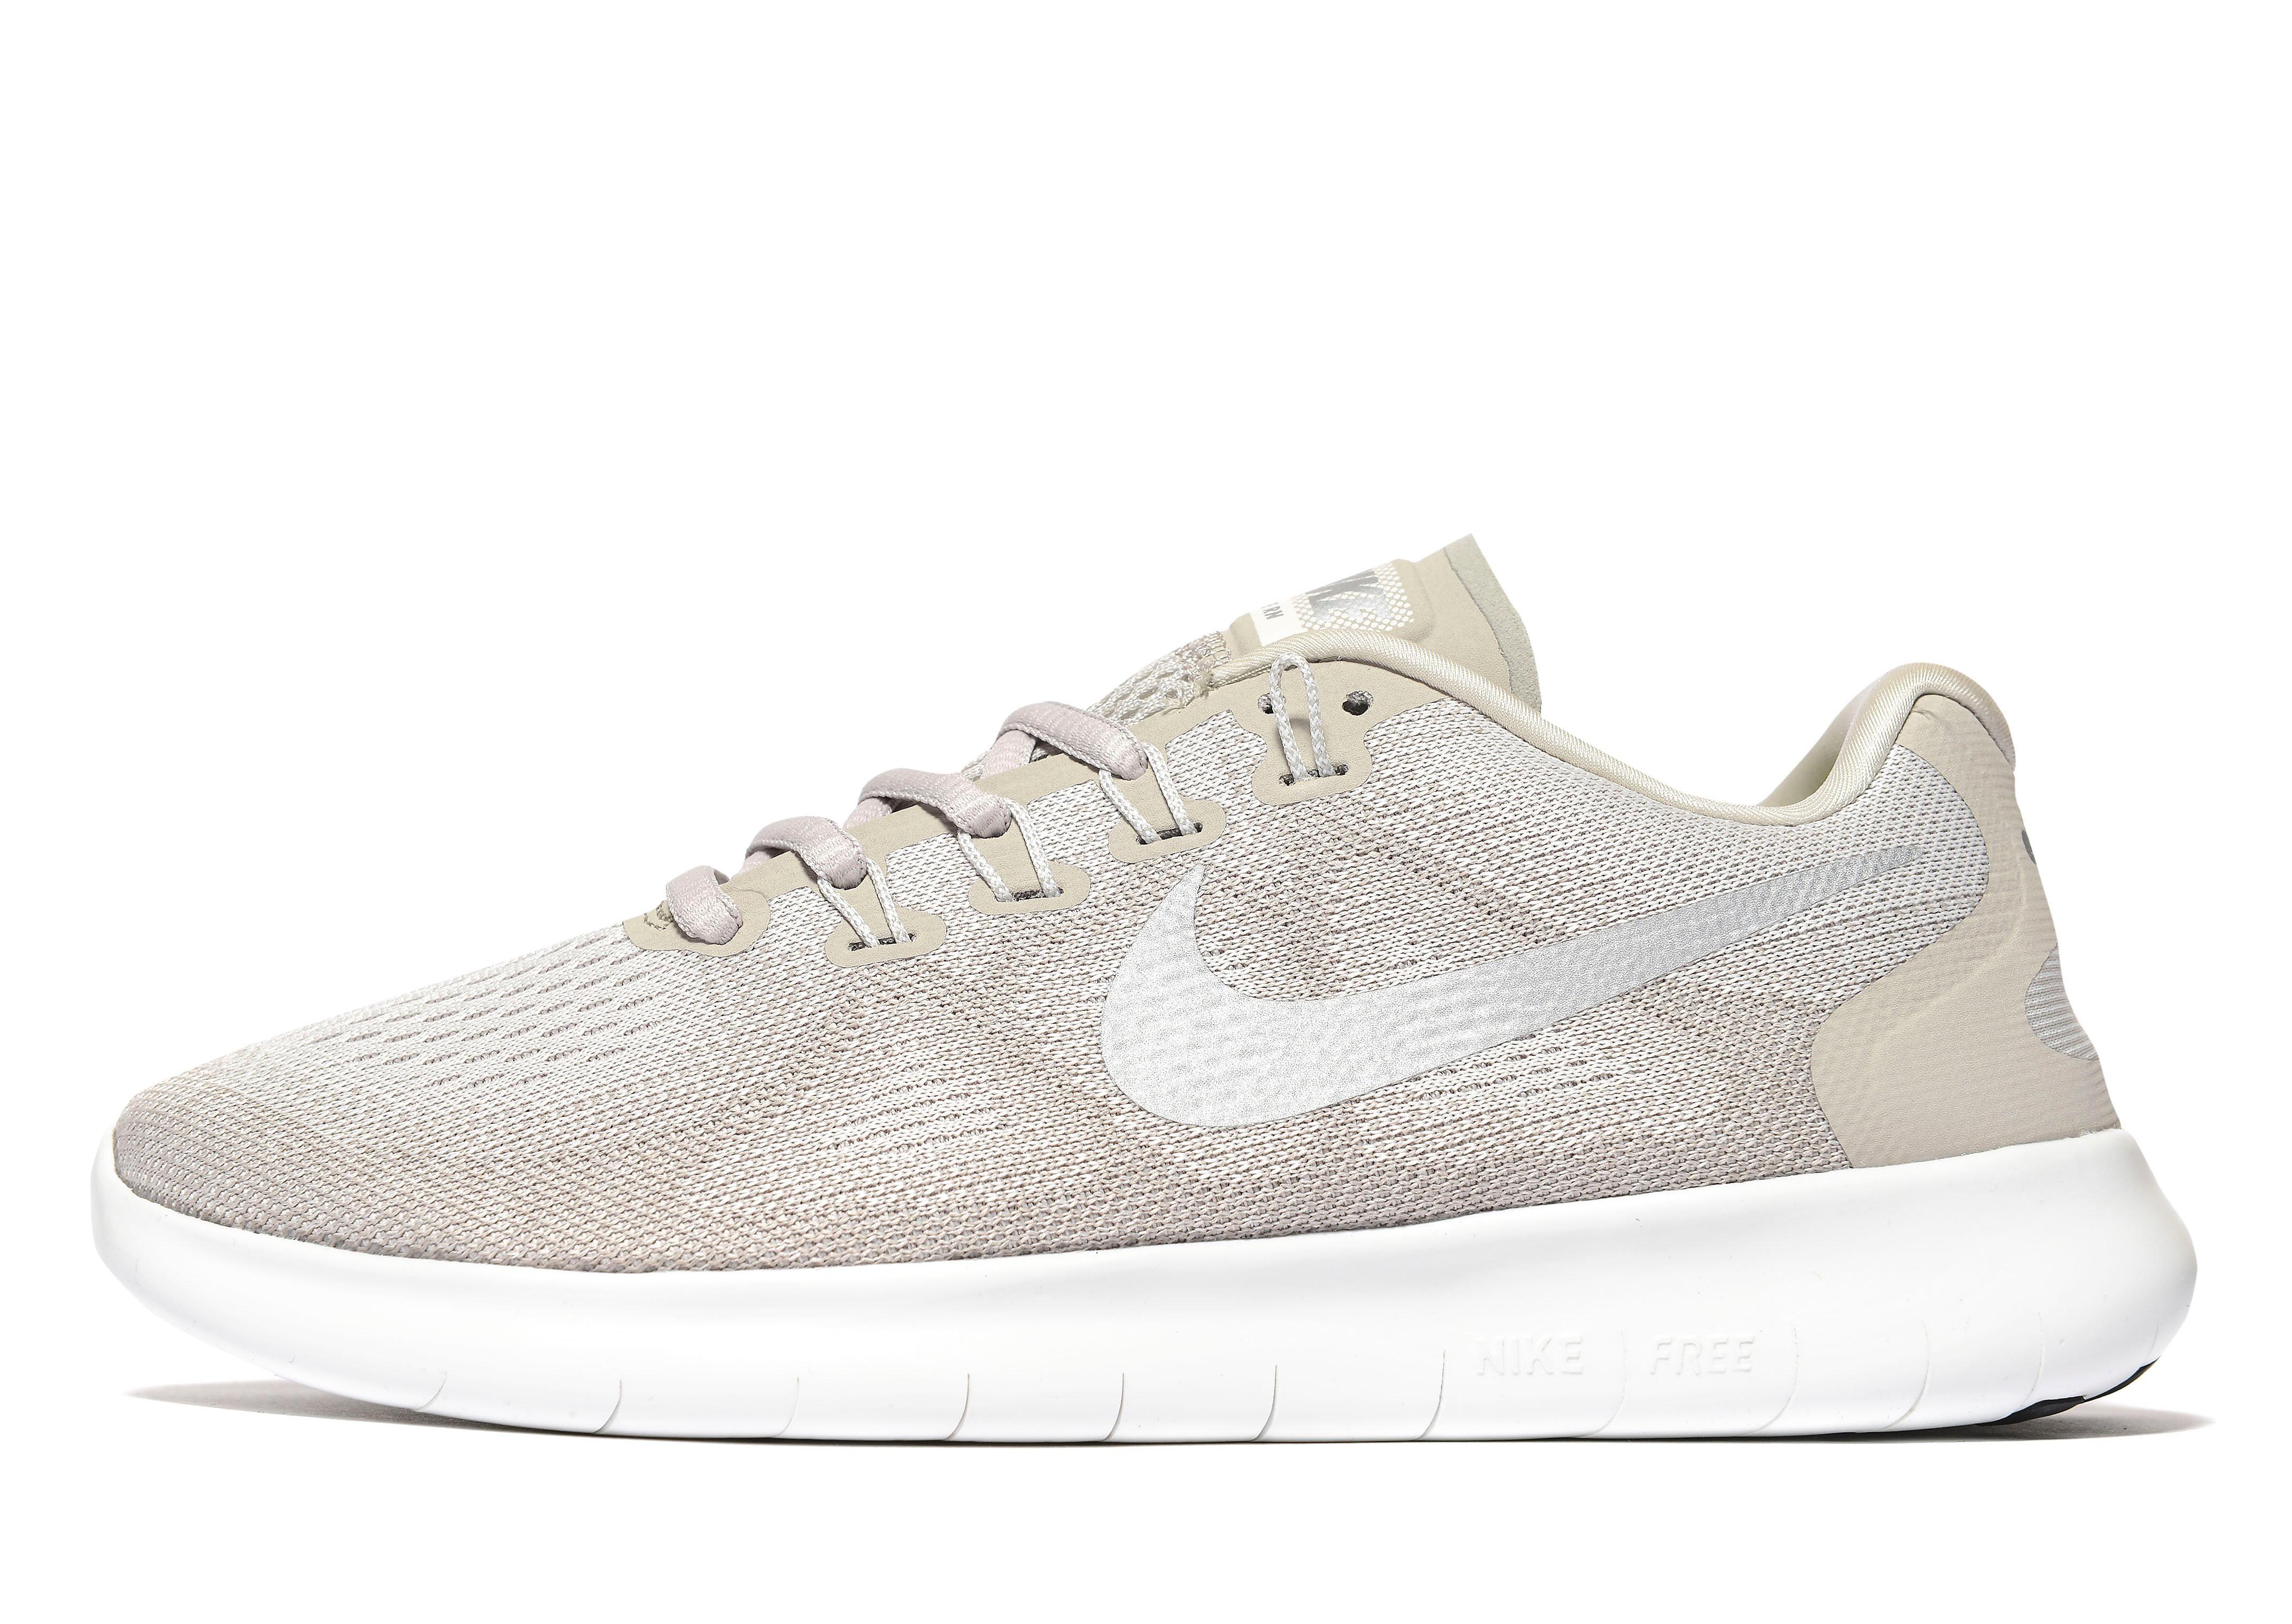 Nike Free RN 2017 Women's